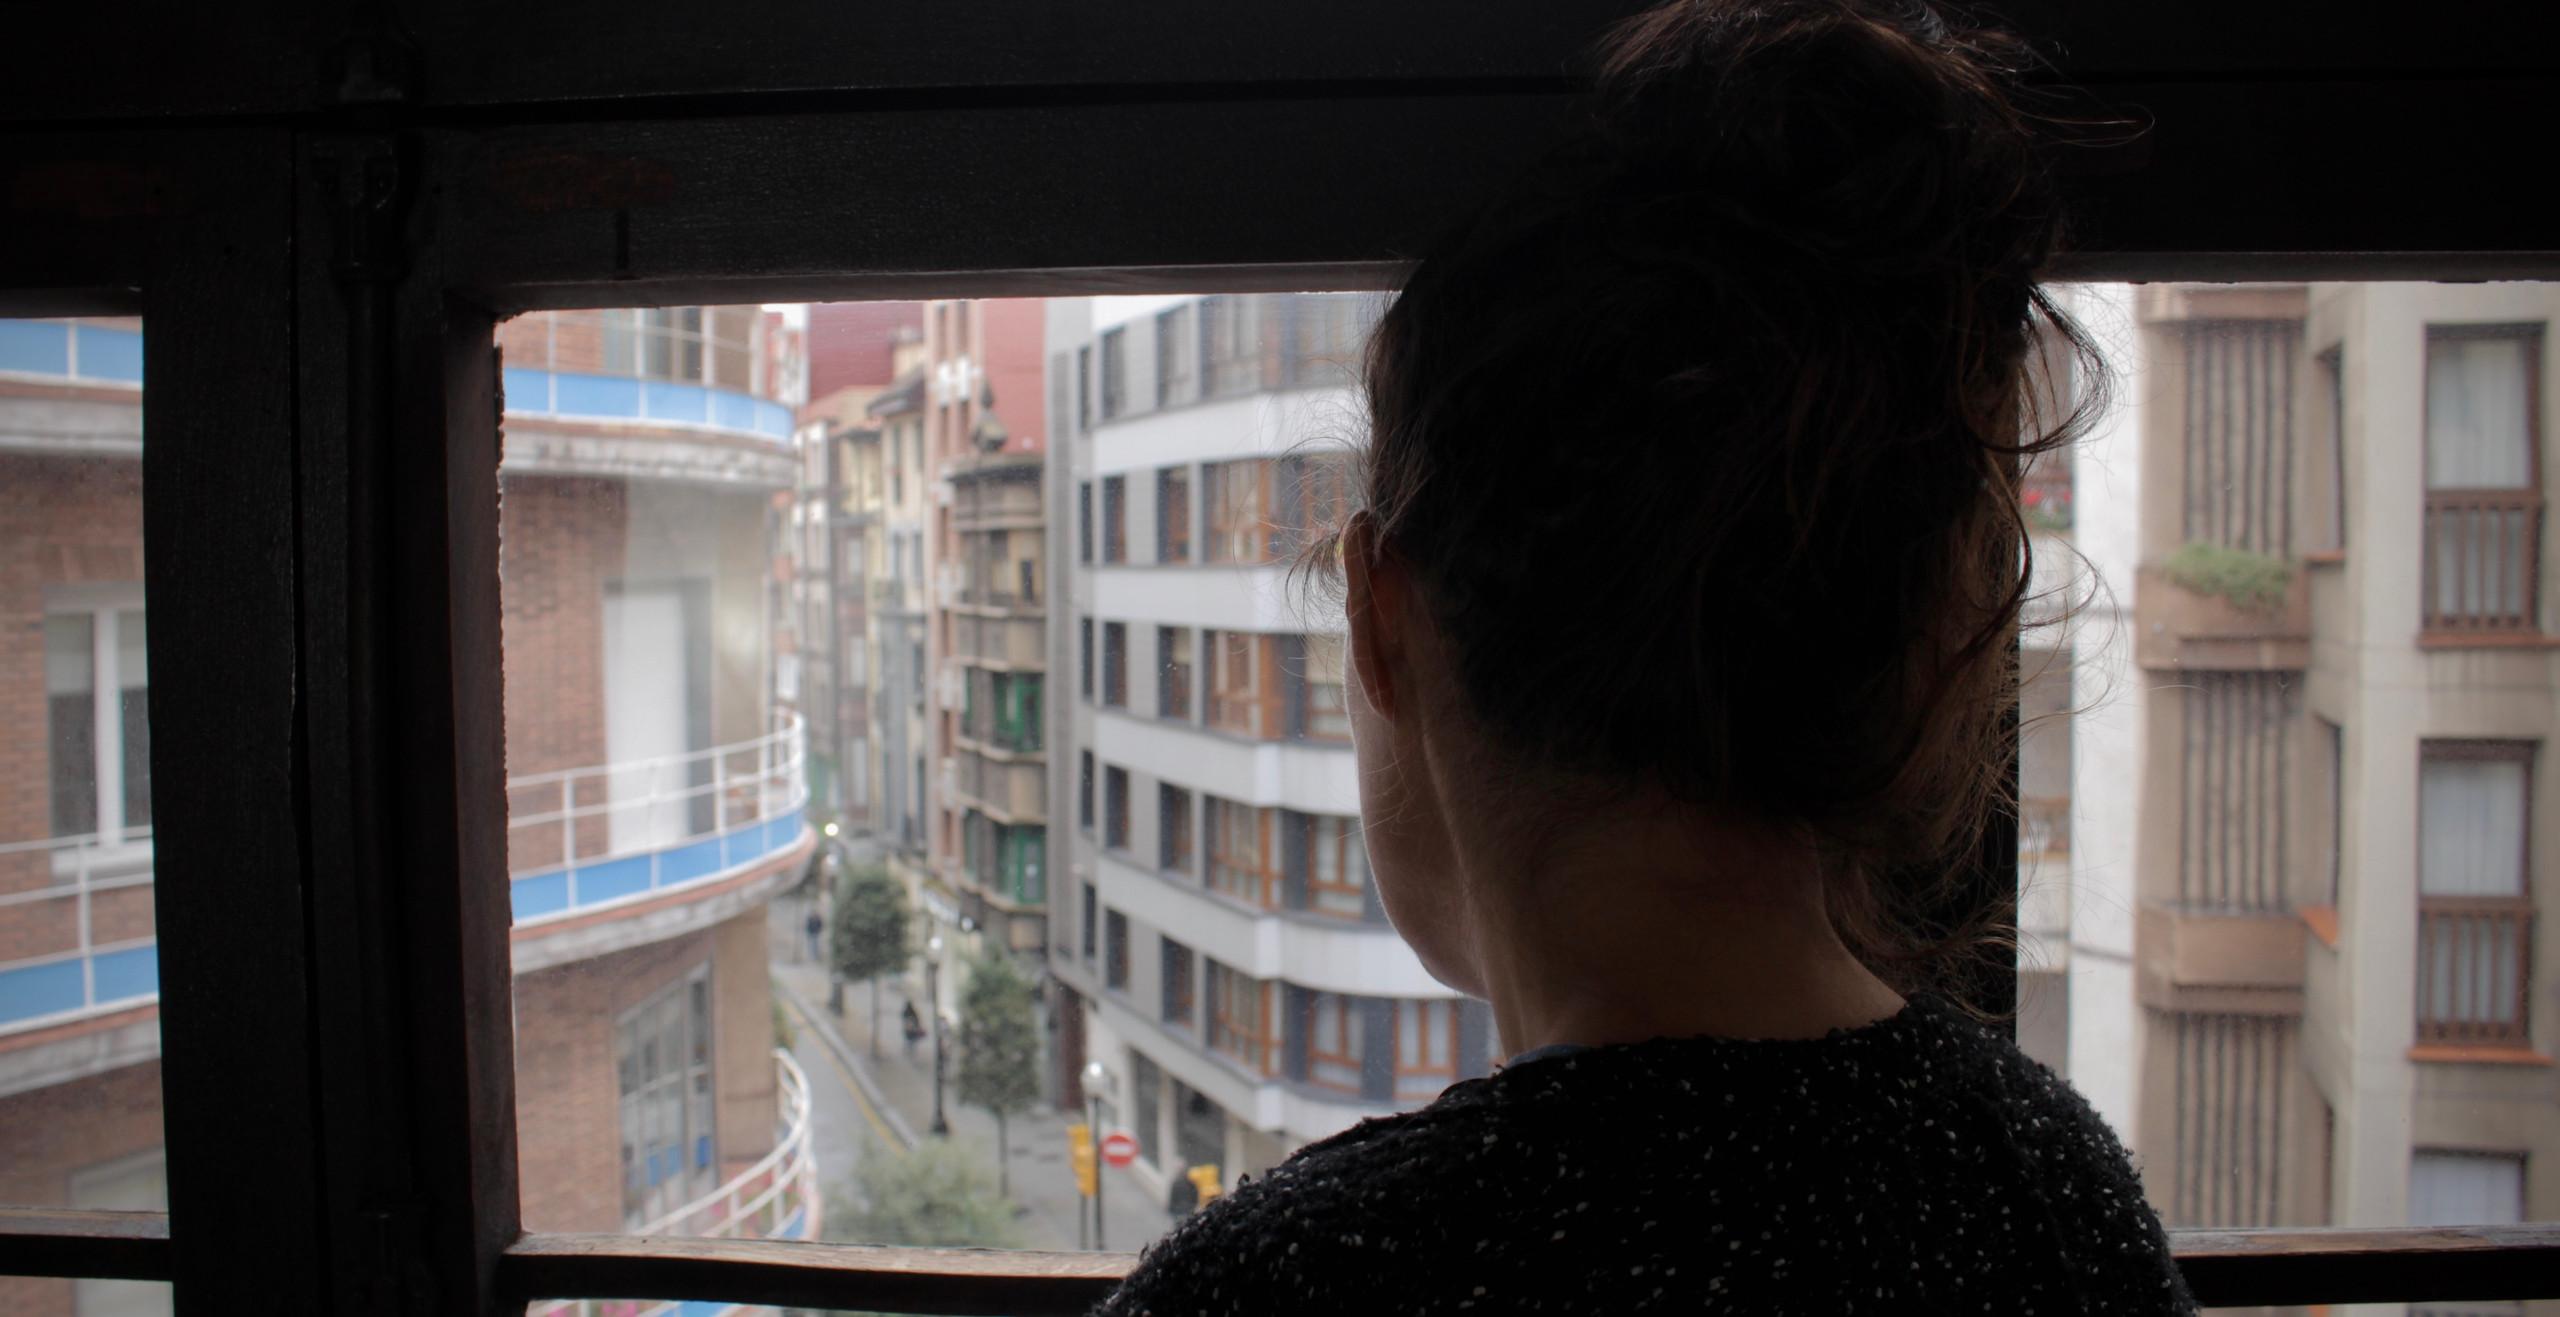 Rebeca en la ventana